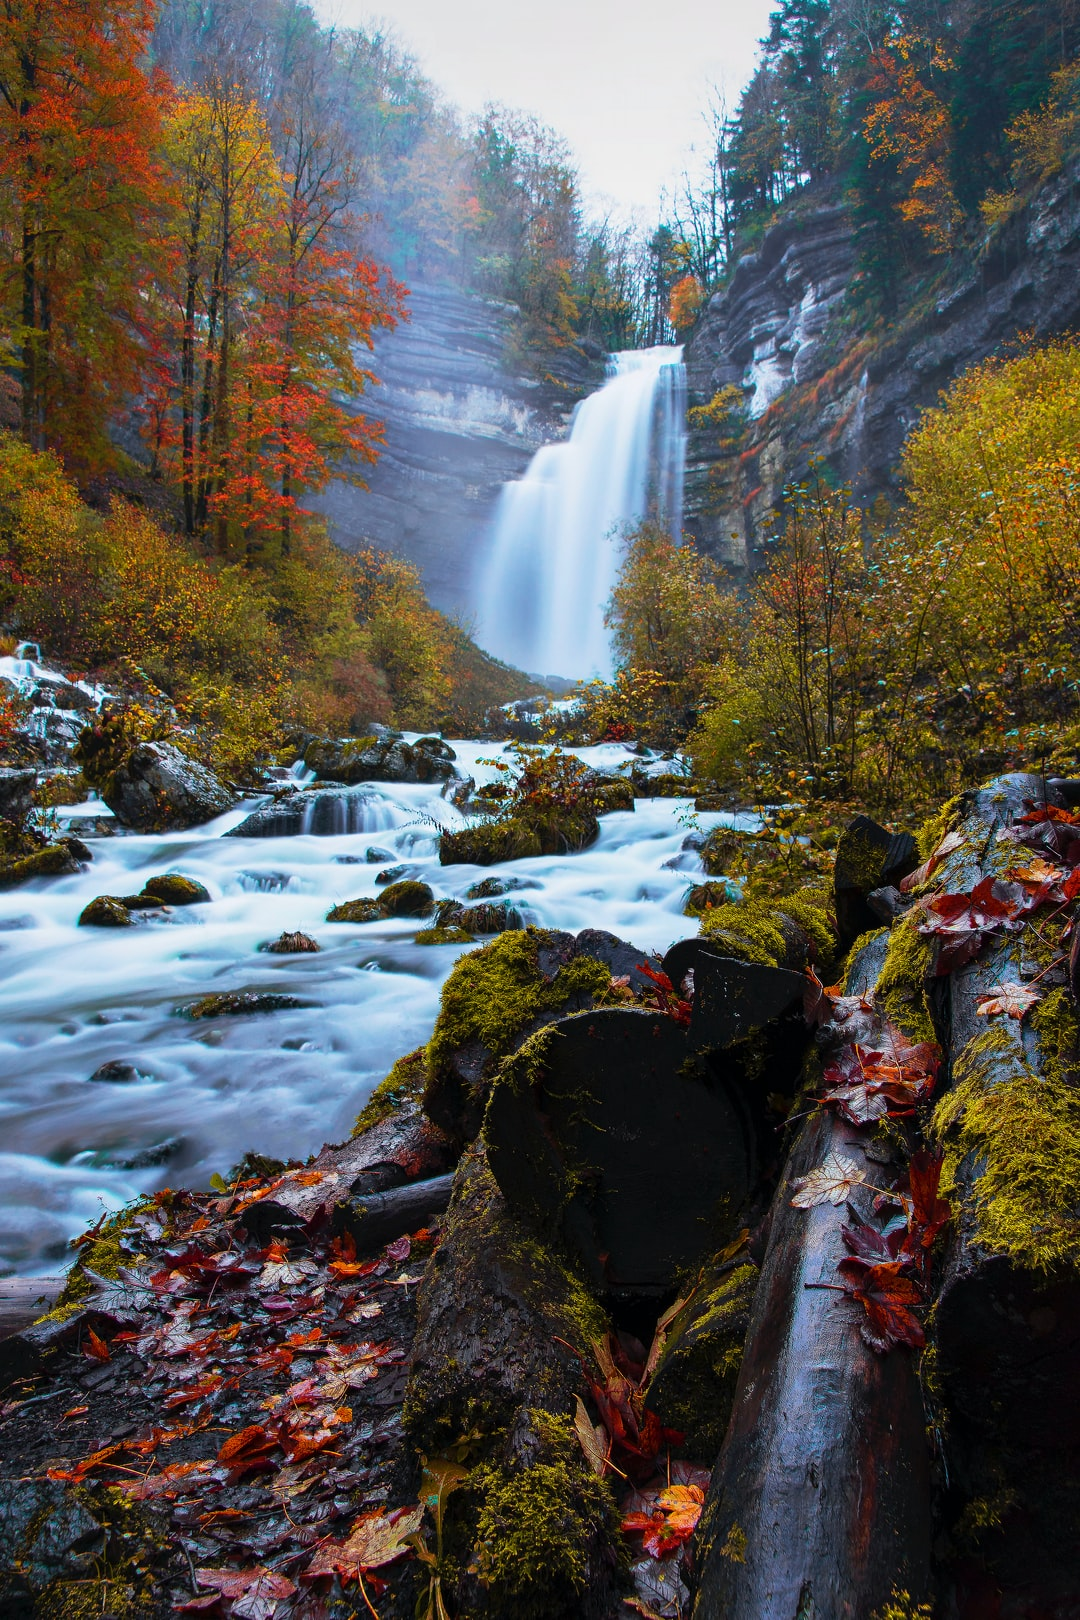 Les cascades du Hérisson - Jura, France Autumn 2019